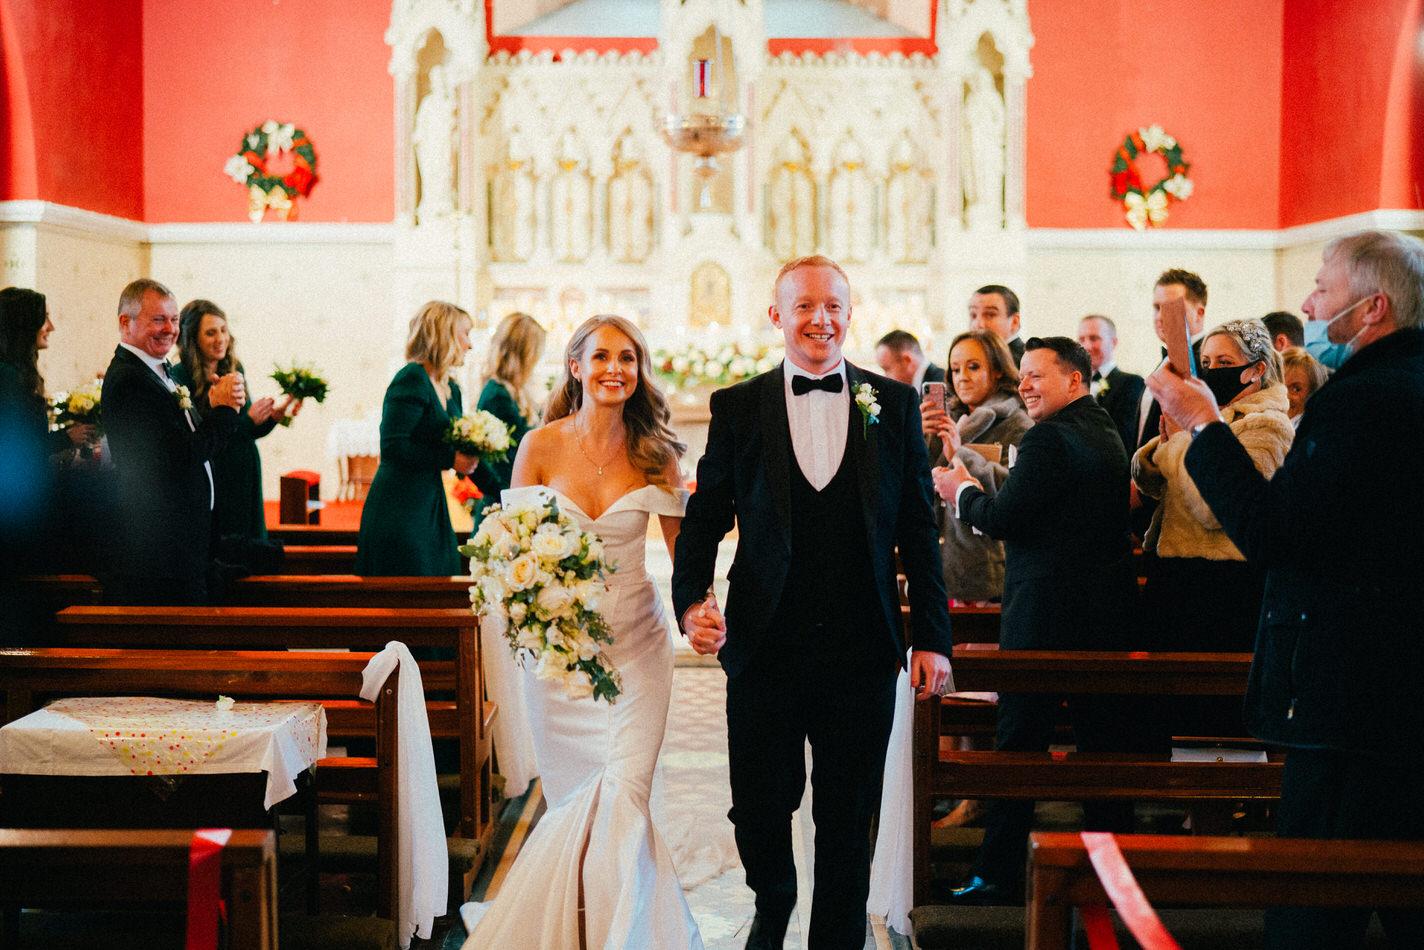 Castle-wedding-ireland-photos- 0144 97